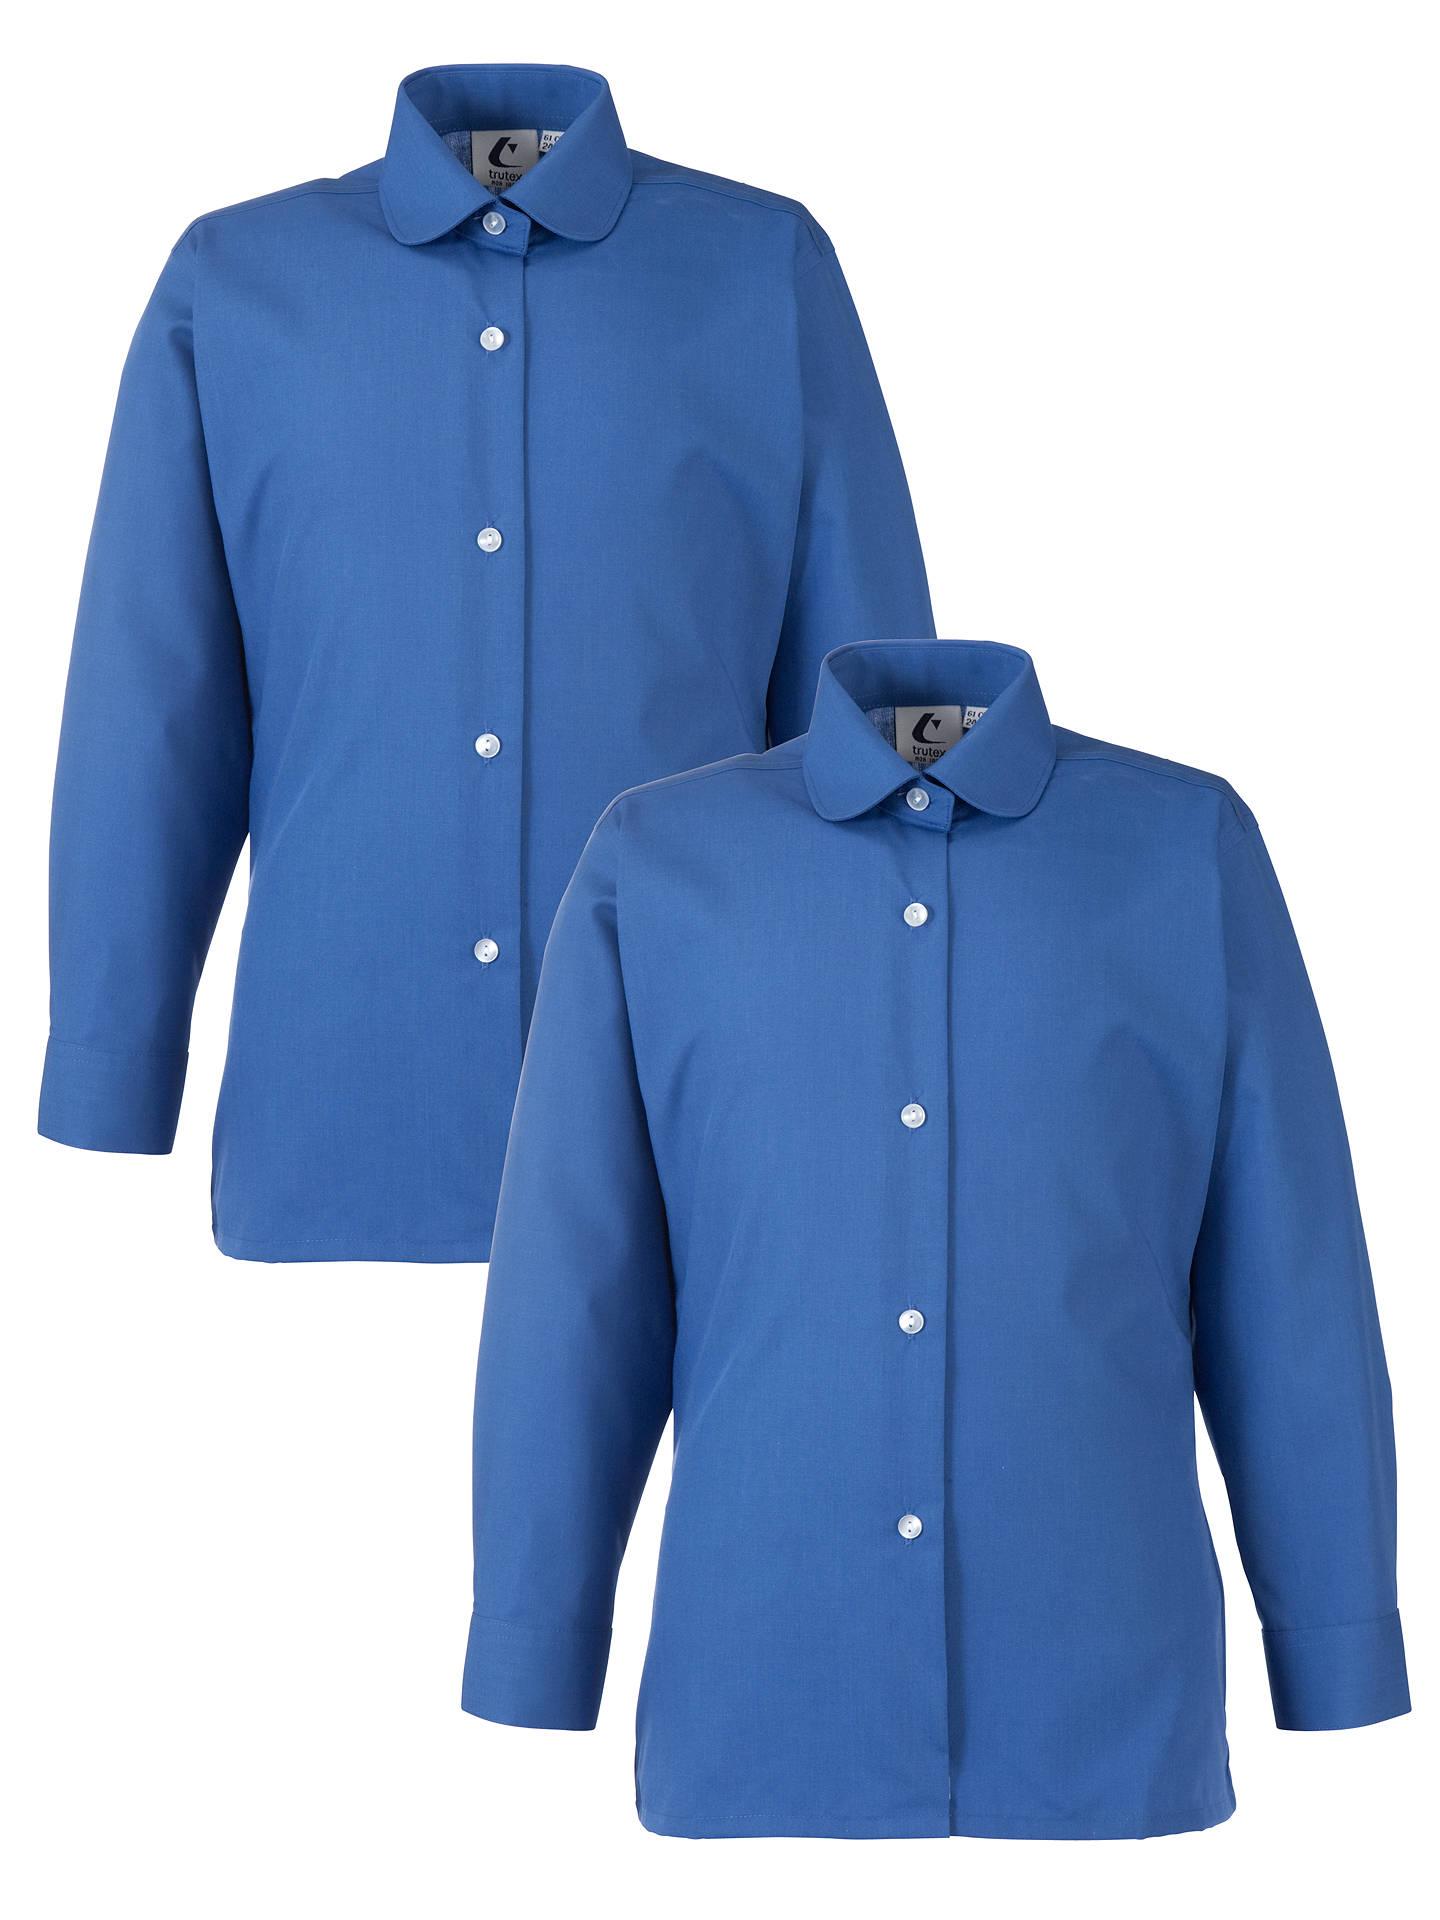 eec7a140770 BuyGirls  School Long Sleeve Collar Blouse